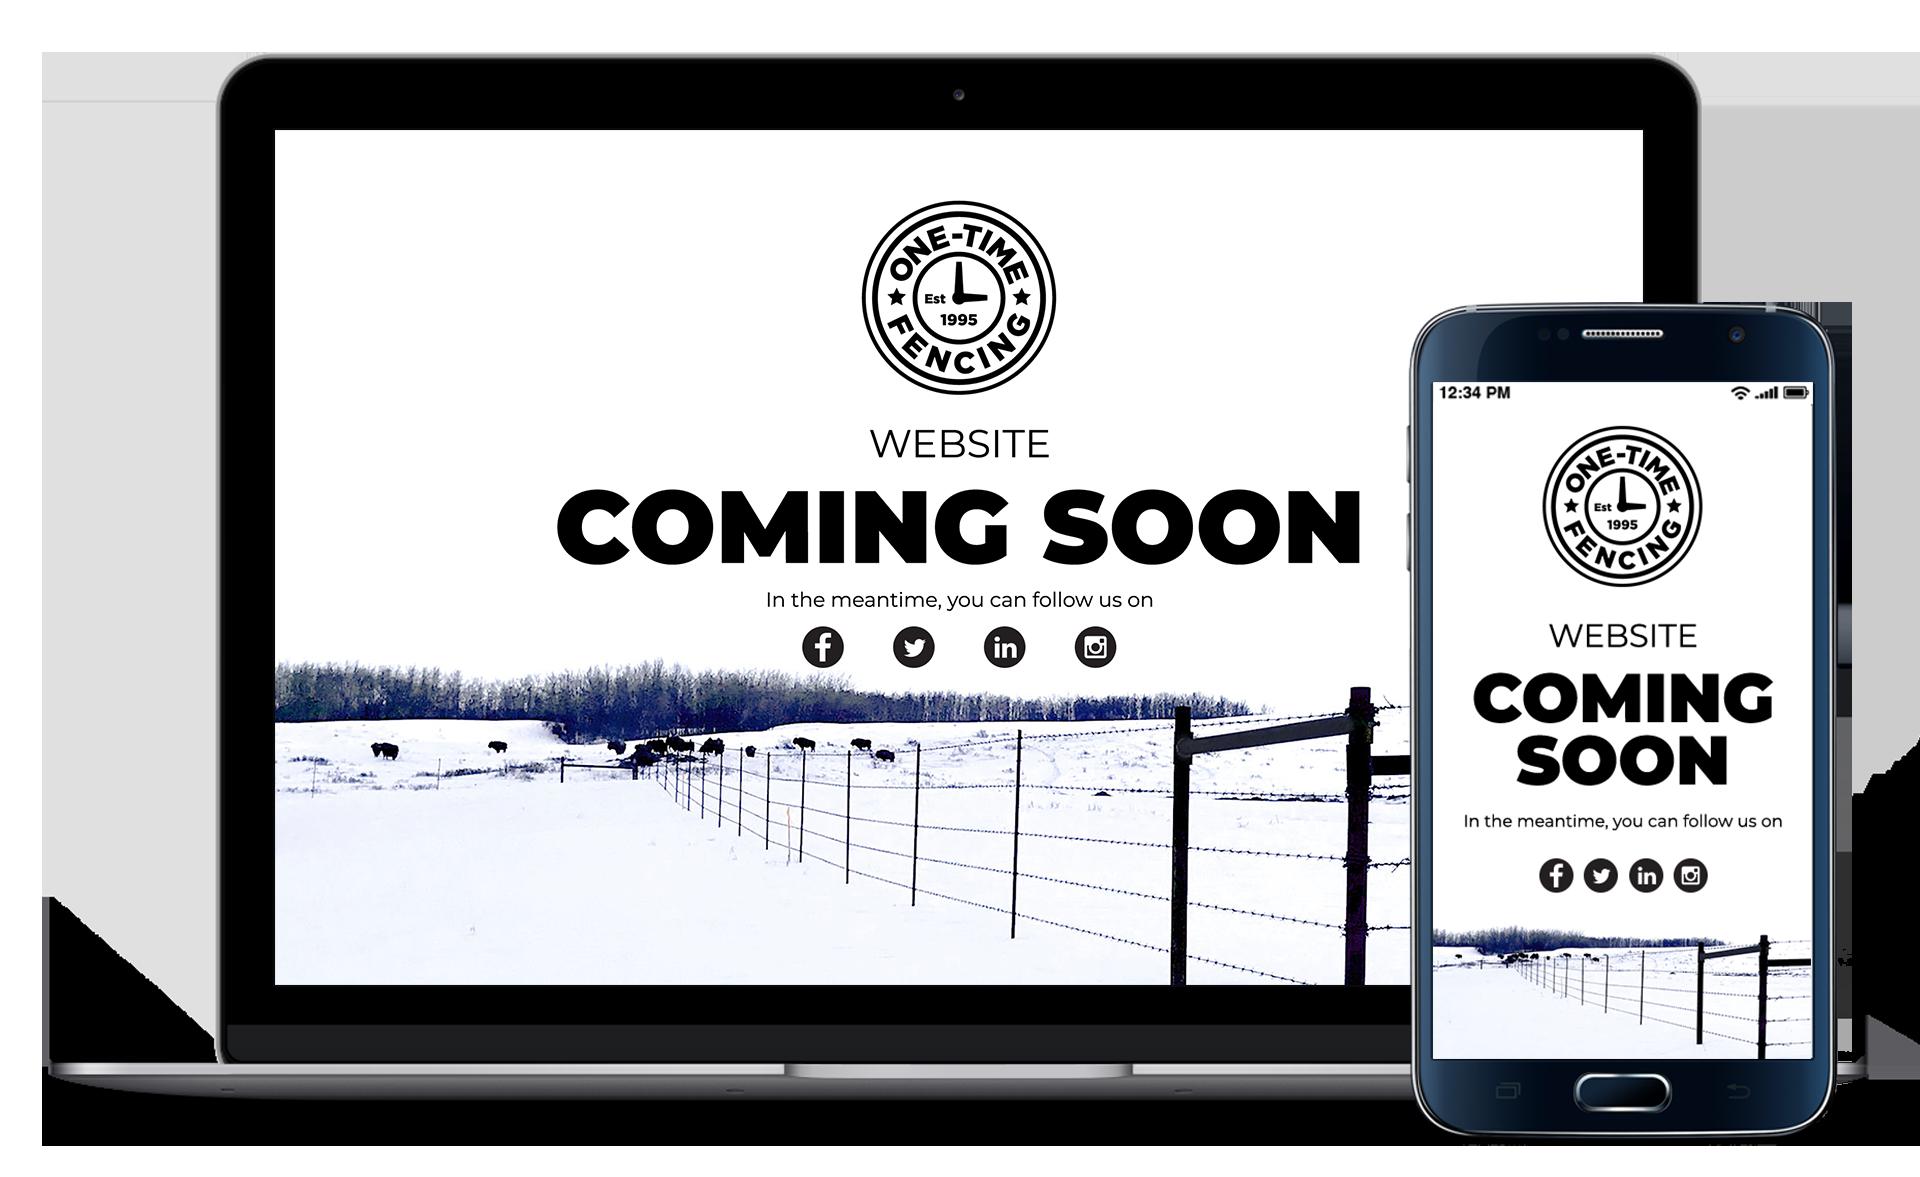 Coming-Soon-Laptop